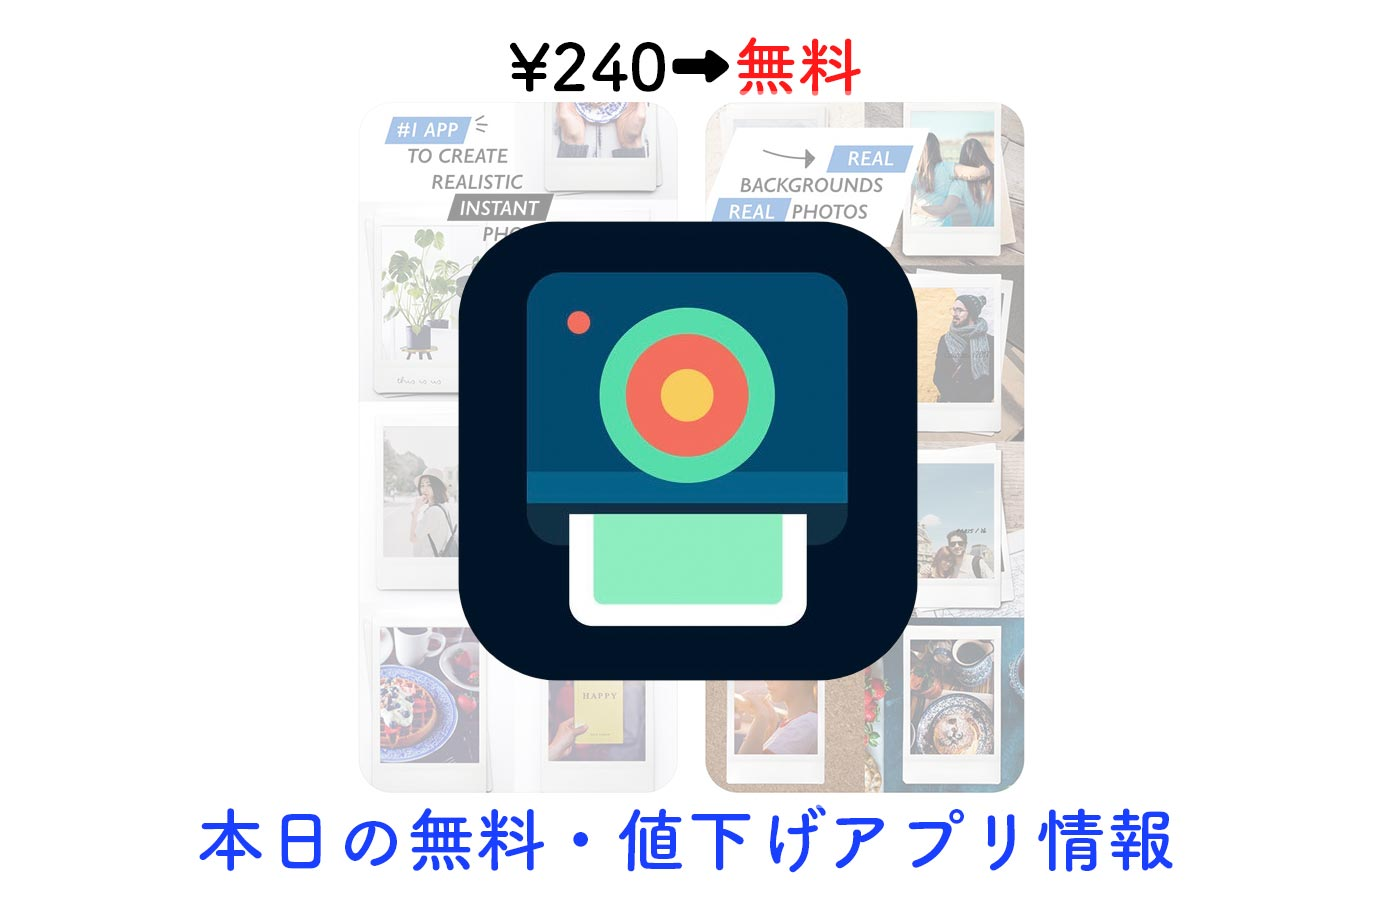 Appsale0206